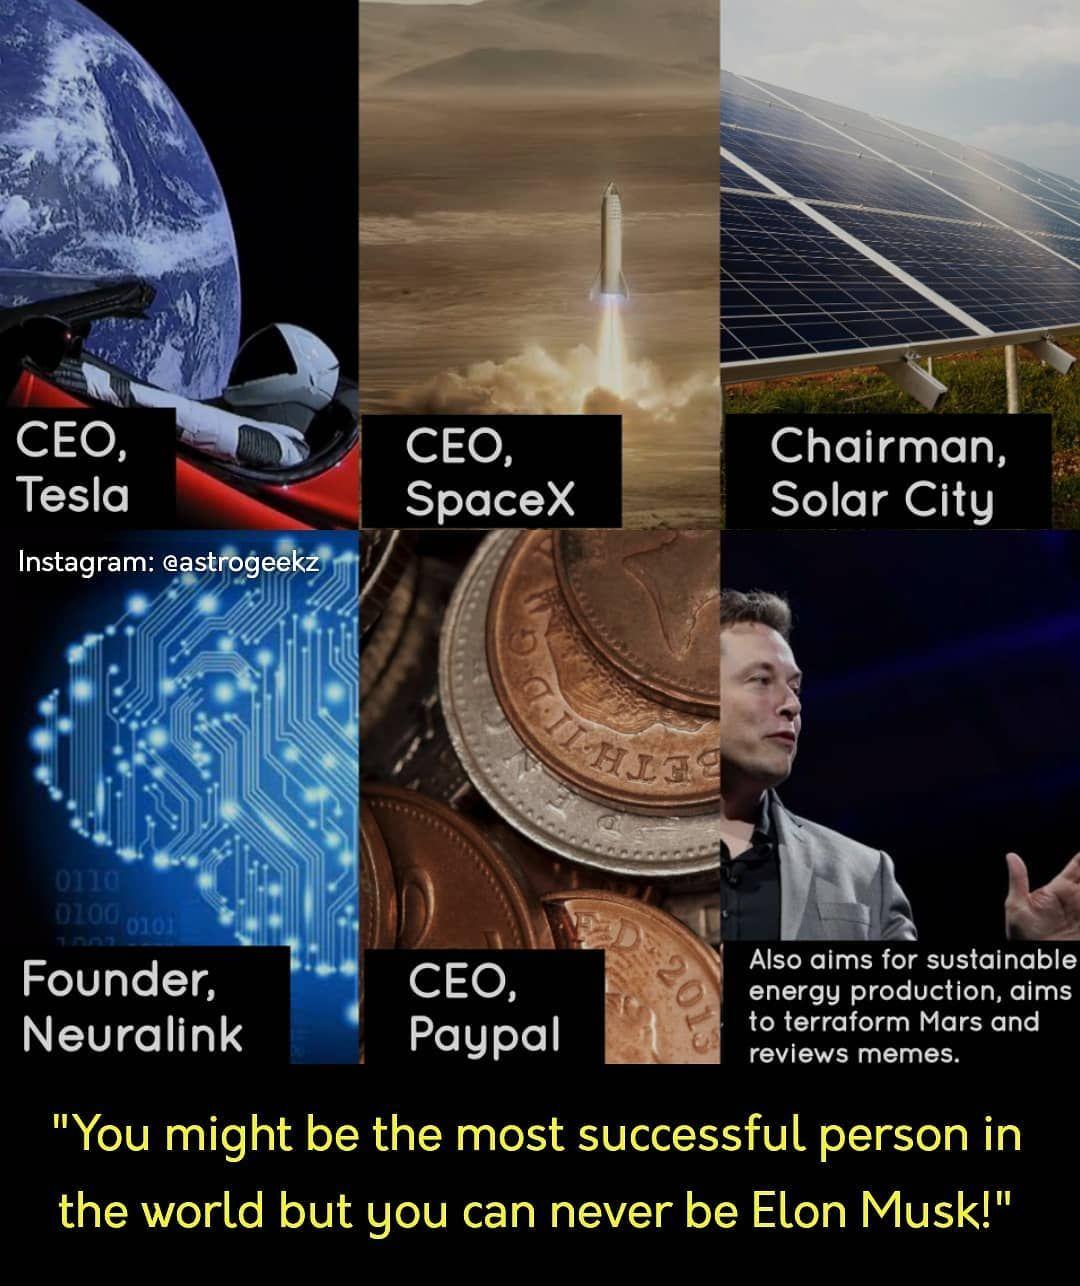 Who Loves Elon Musk Elonmusk Spacex Mars Earth Tesla Astronomy Astrophysics Physics Physicist Business Inspiration Tesla Spacex Astrophysics